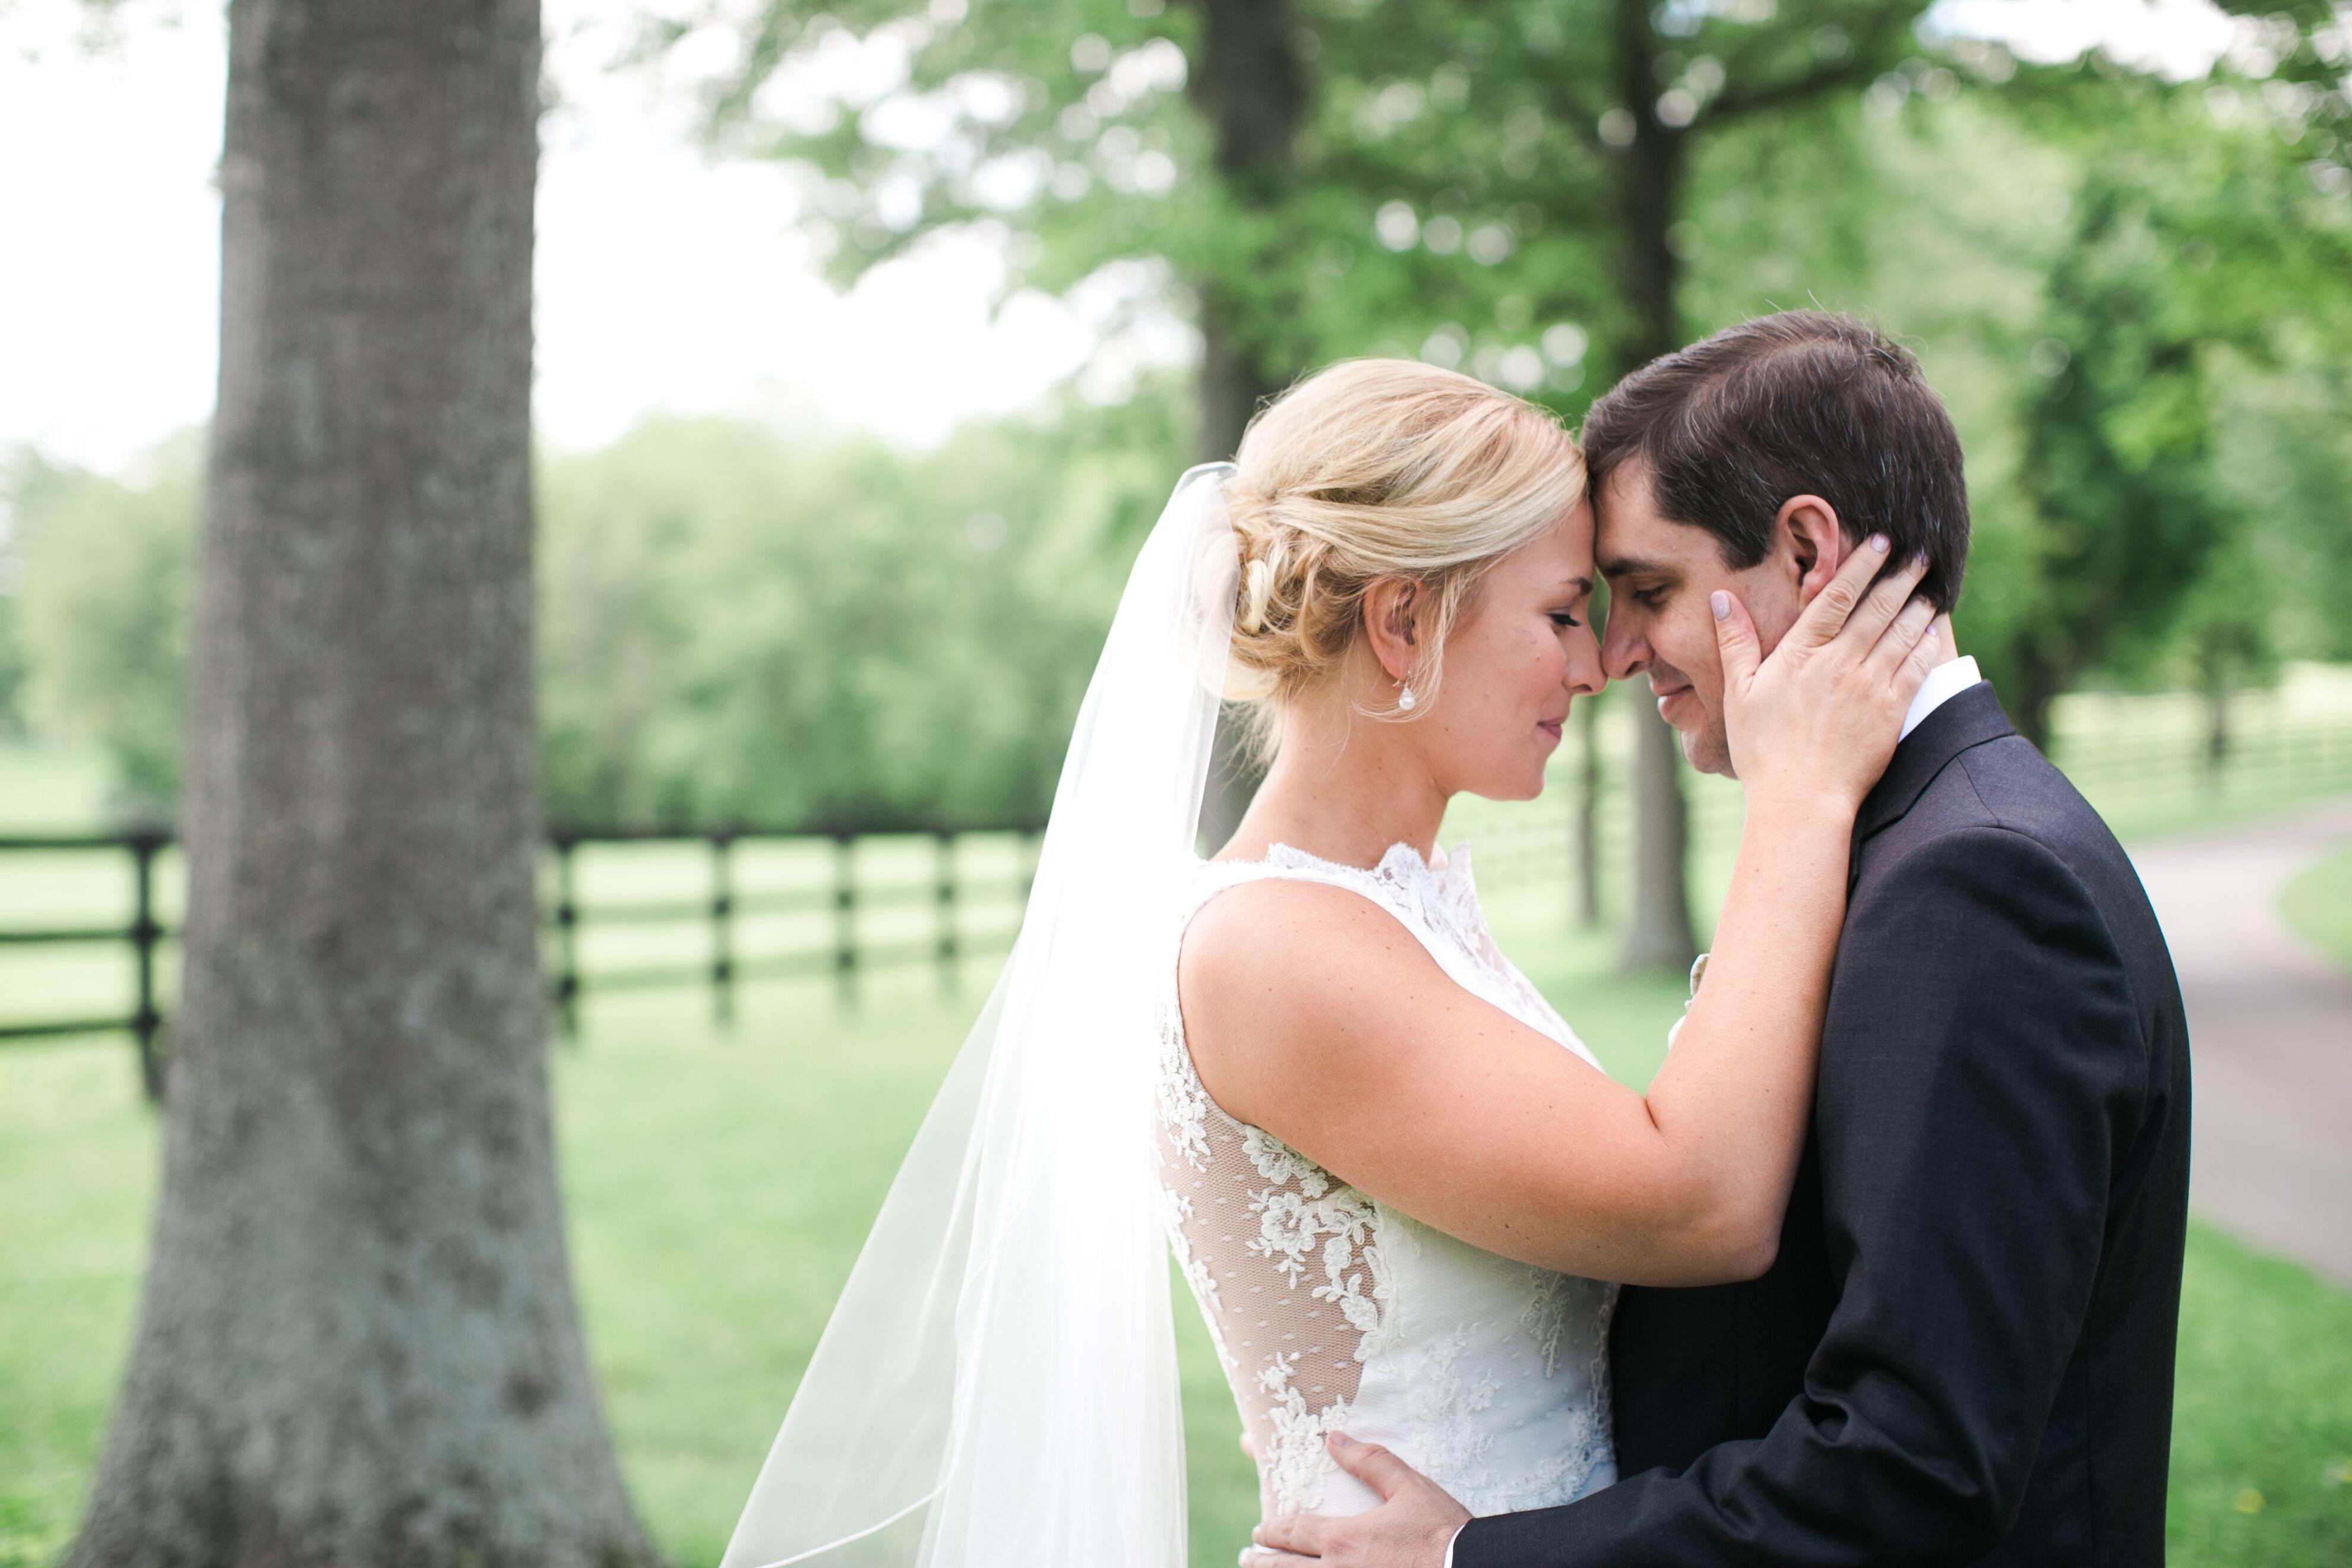 Wedding Planners In Owensboro KY